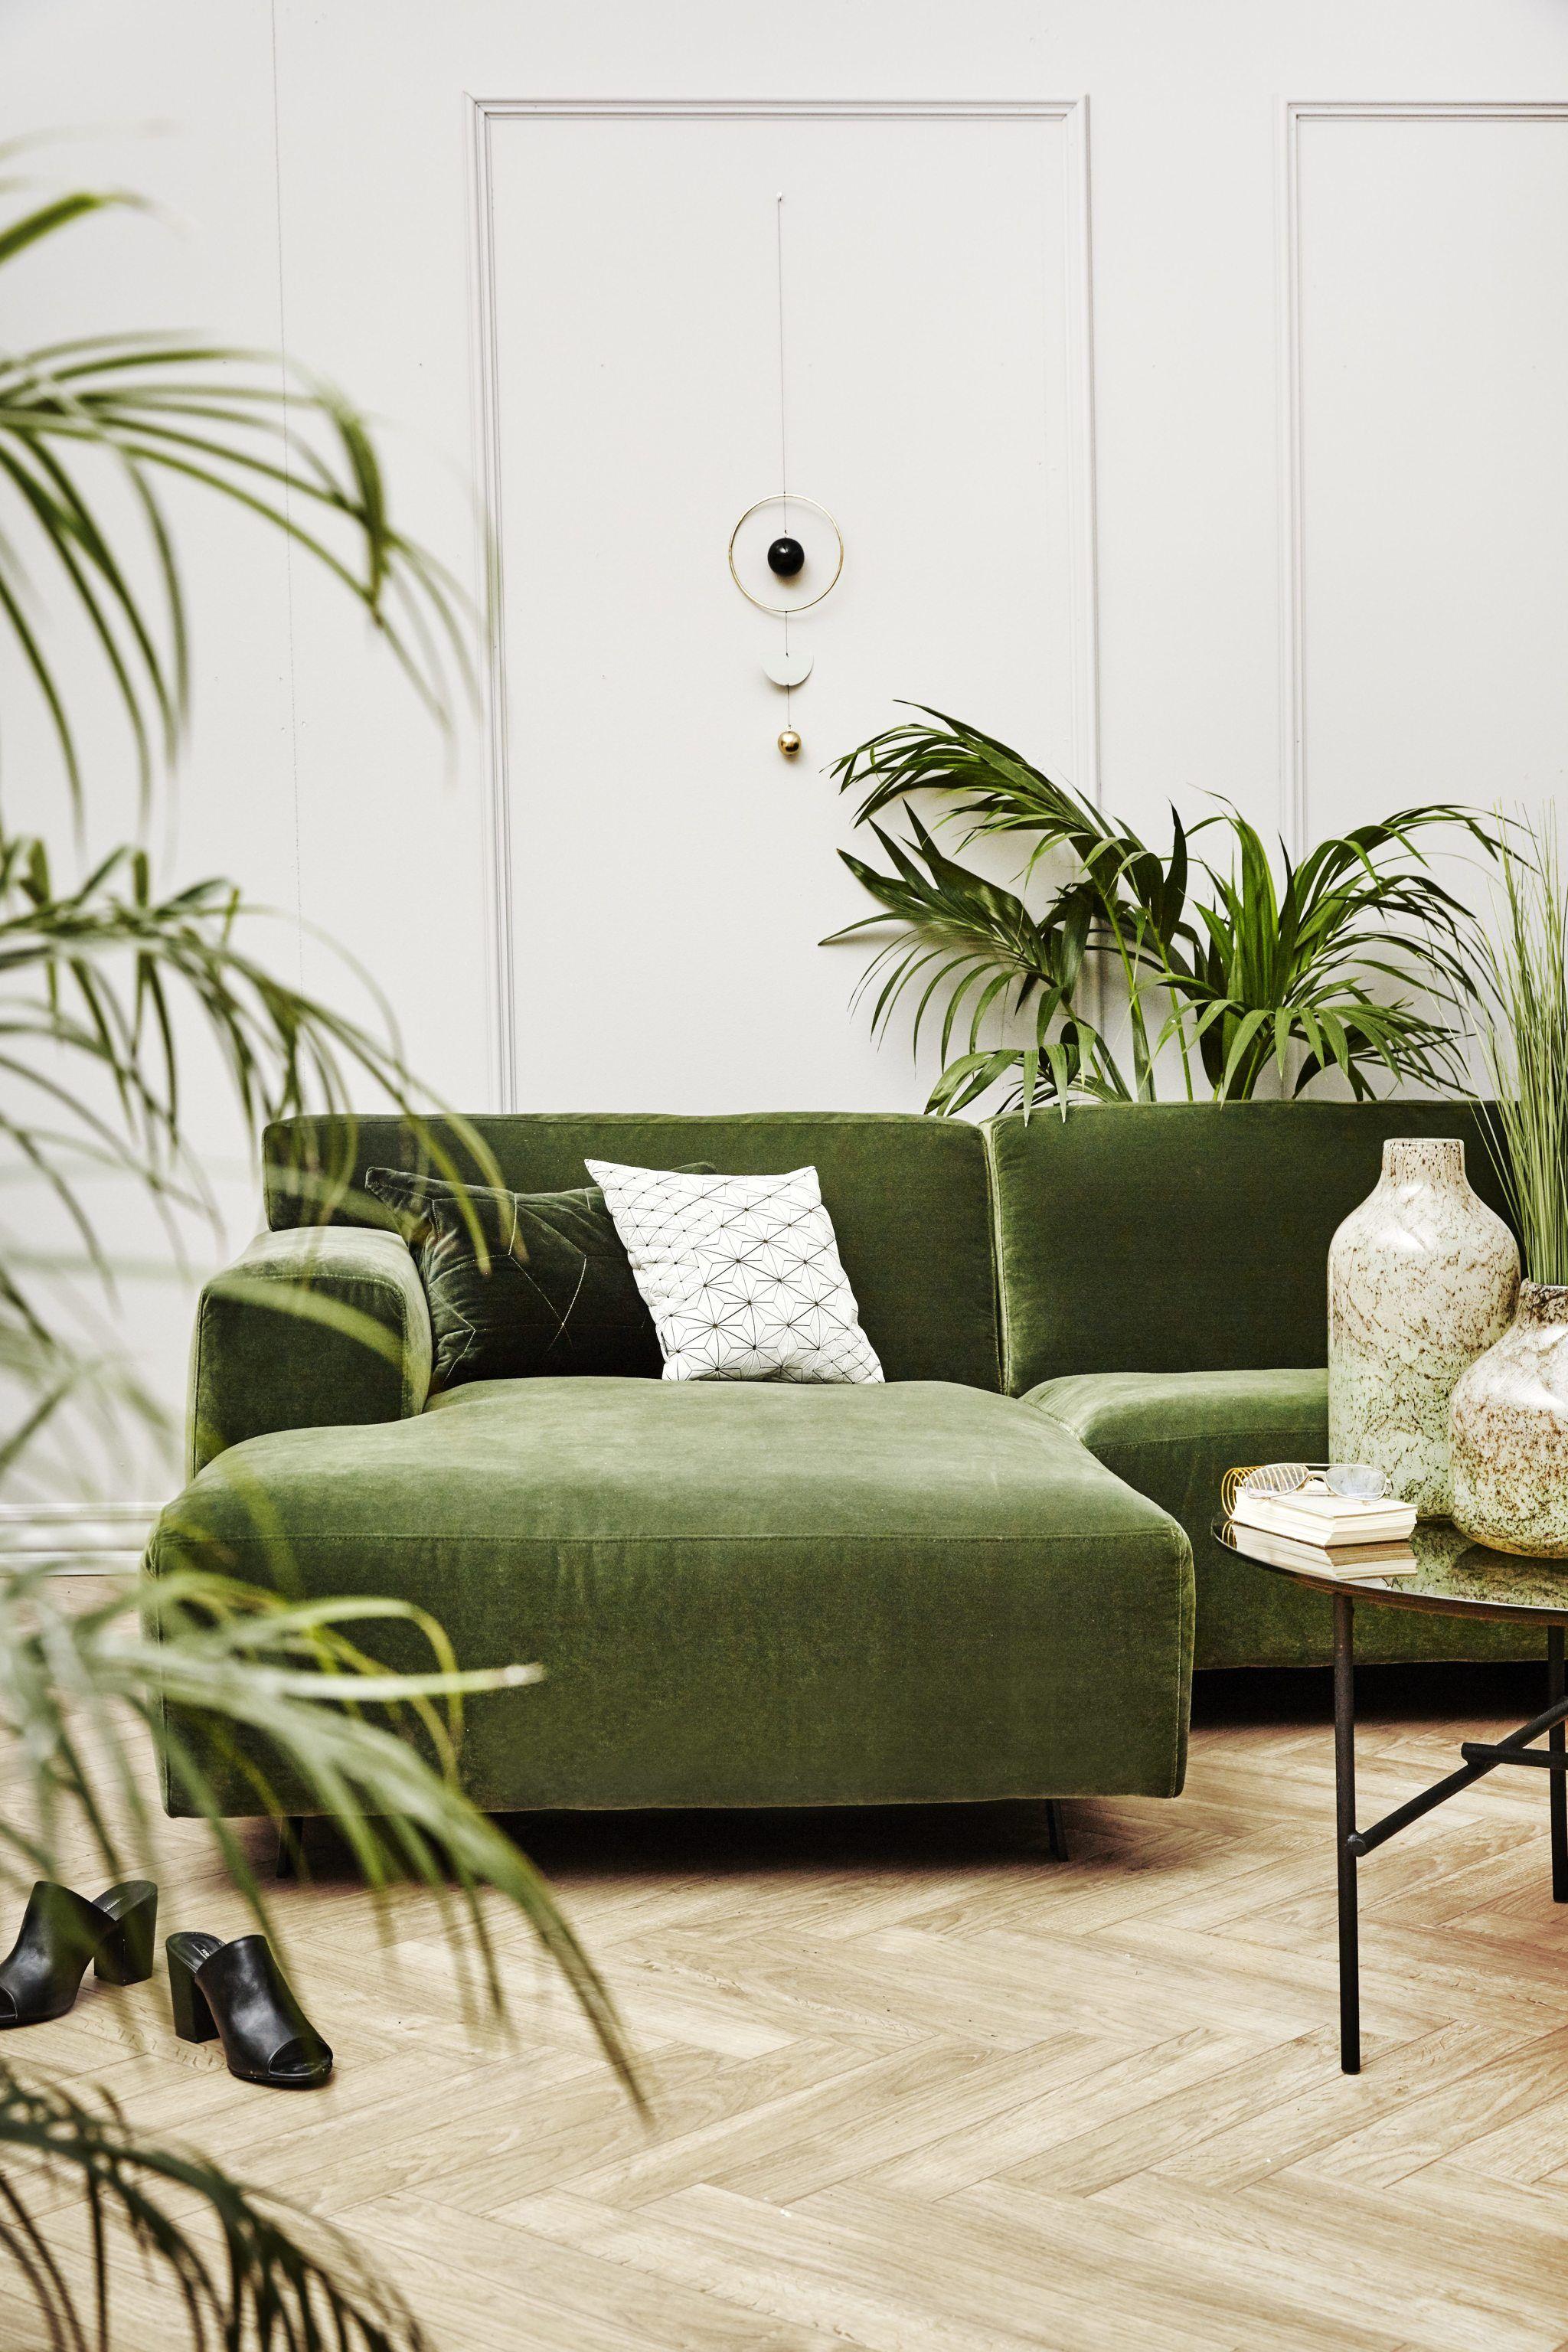 grøn sofa Billedresultat for ilva grøn velour sofa | uu in 2018 | Pinterest  grøn sofa